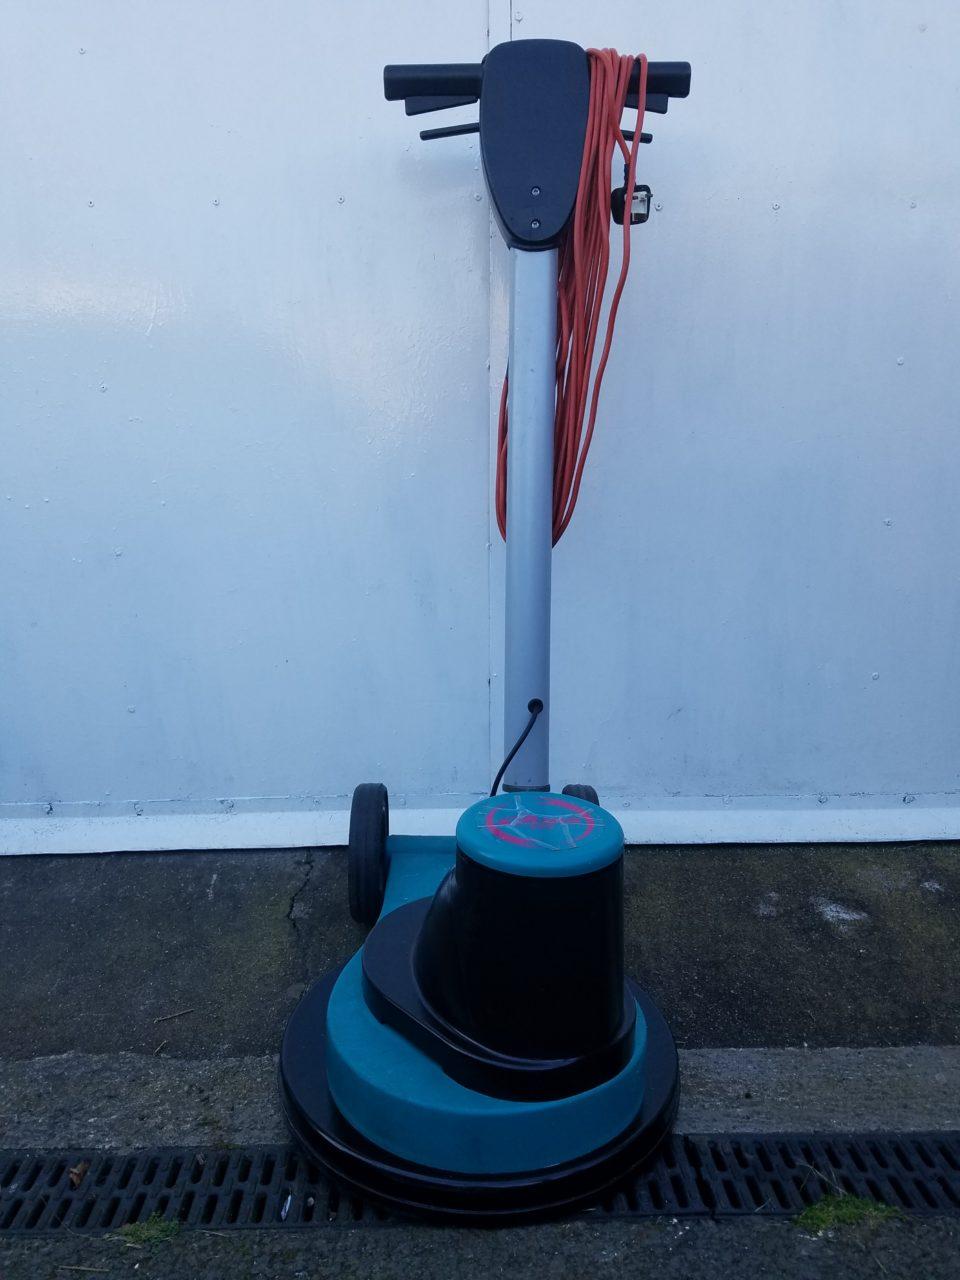 Floor Polishing Machine – Truvox Orbis 400 Floor Polisher